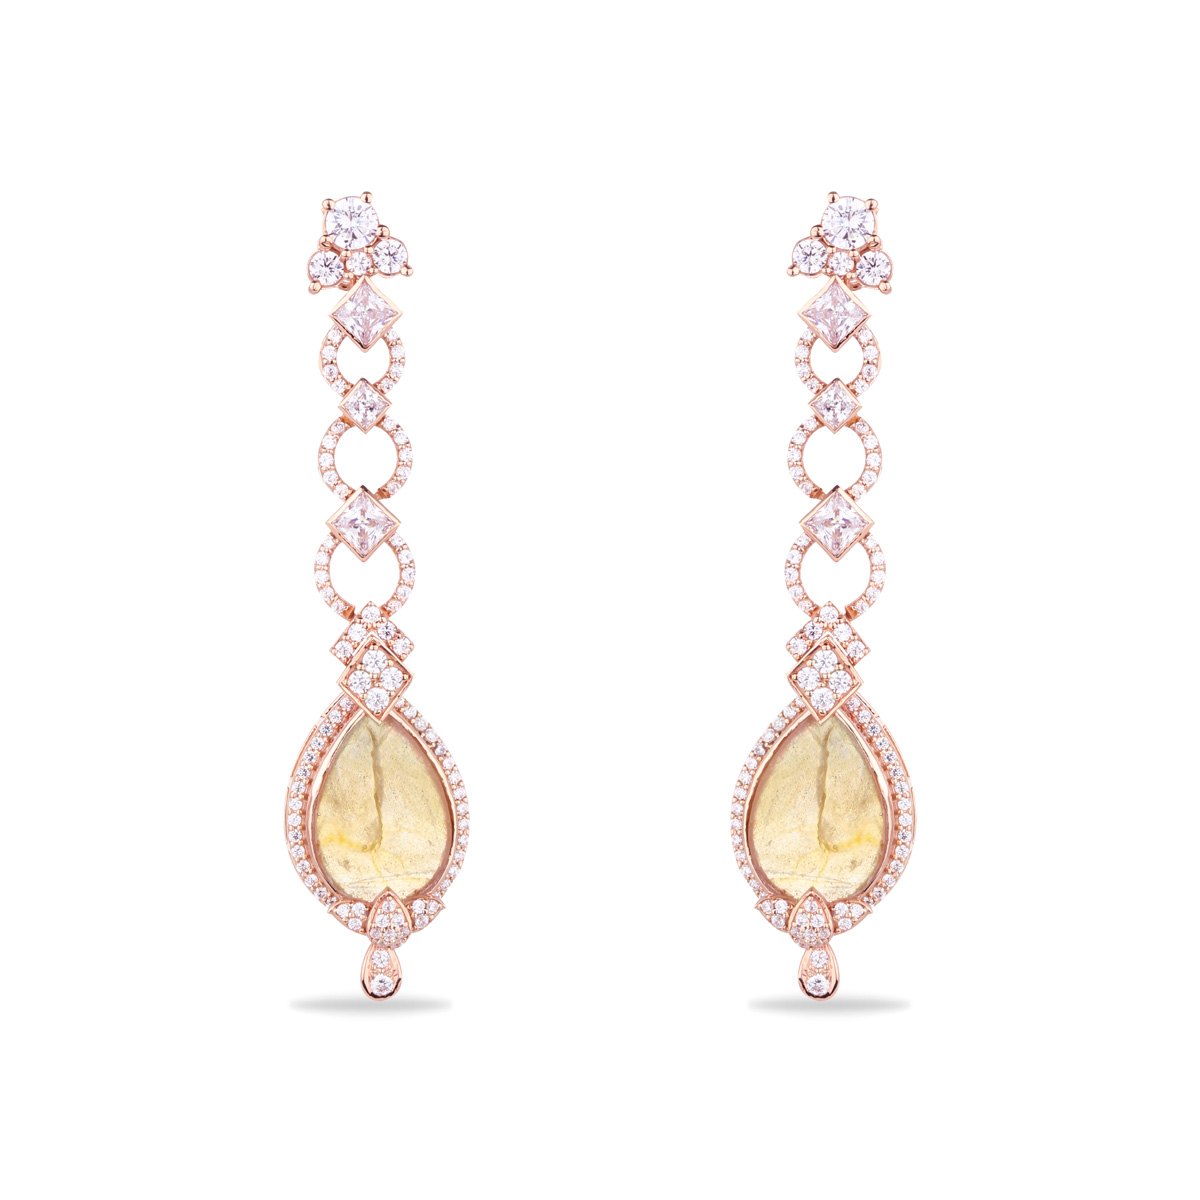 Delicate Swarovski Earrings